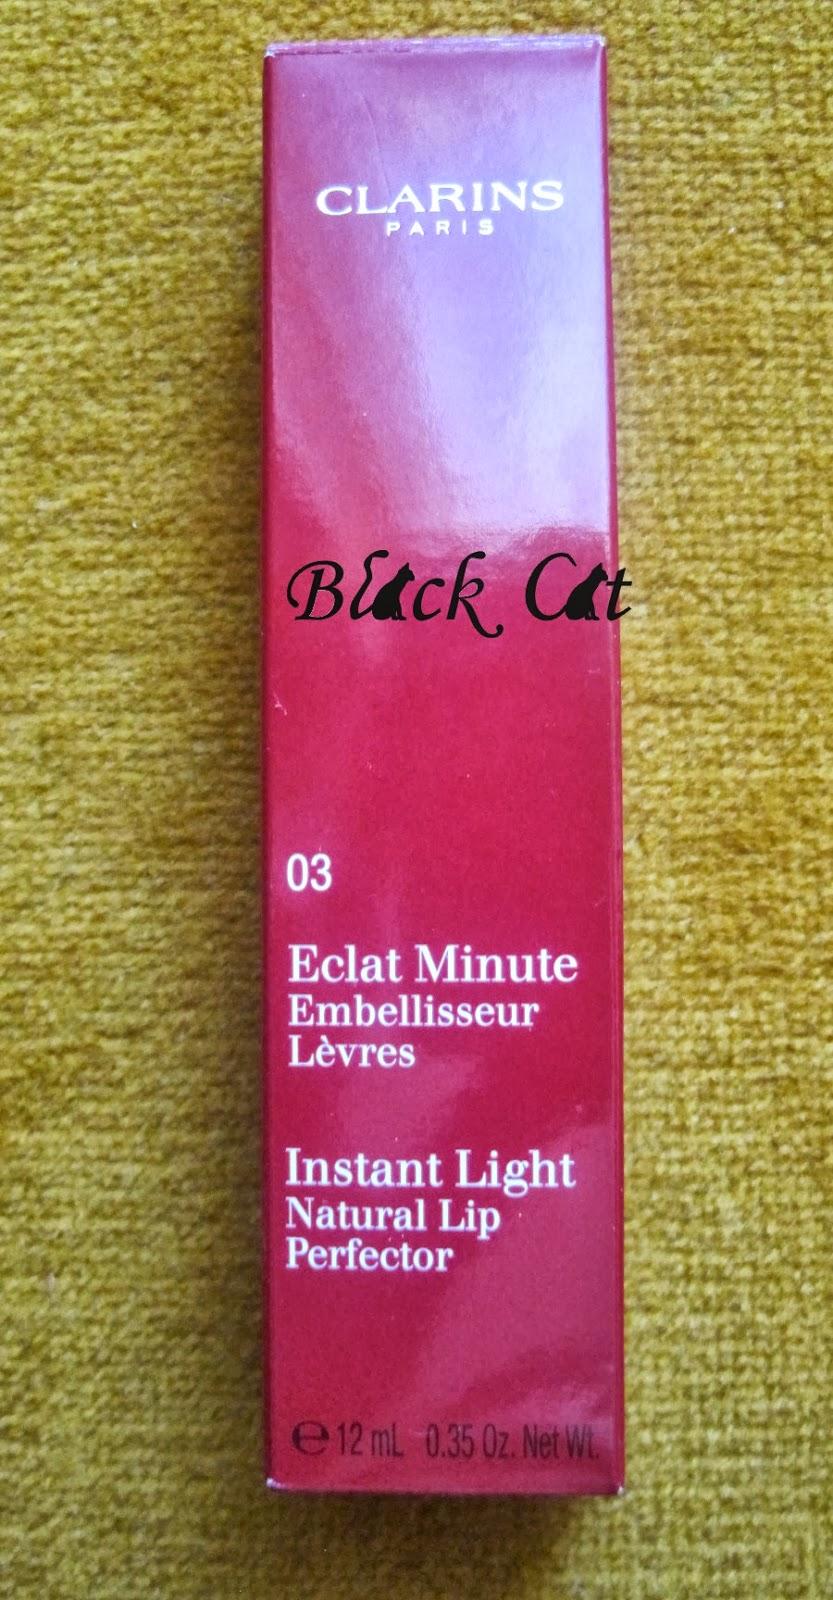 beautyorbread: Clarins Instant Light Natural Lip Perfector